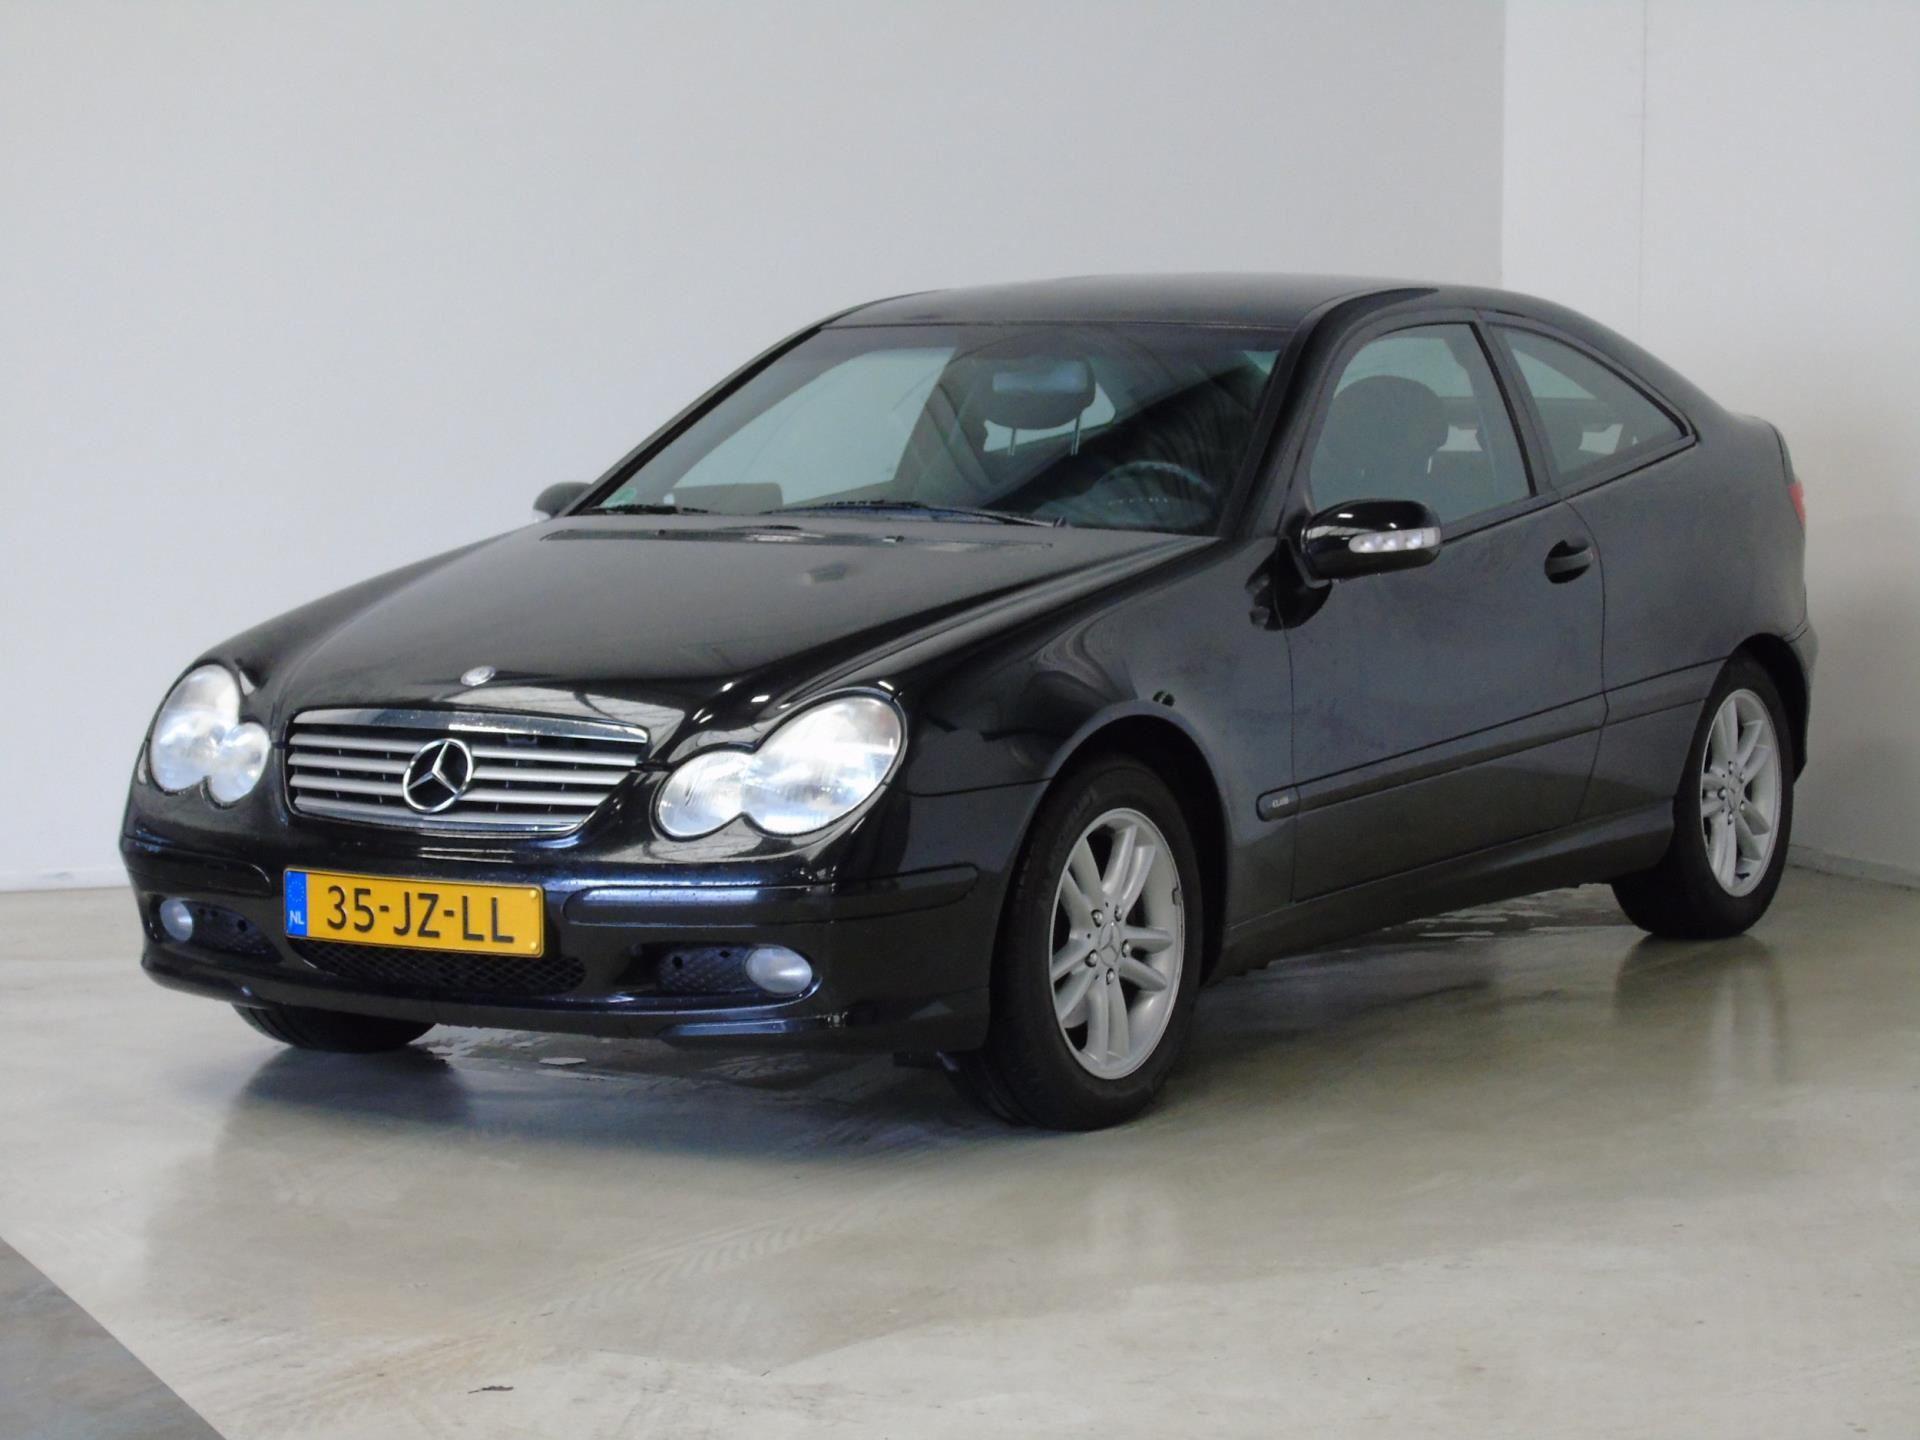 Mercedes-Benz C-klasse Sportcoupé occasion - van Dijk auto's